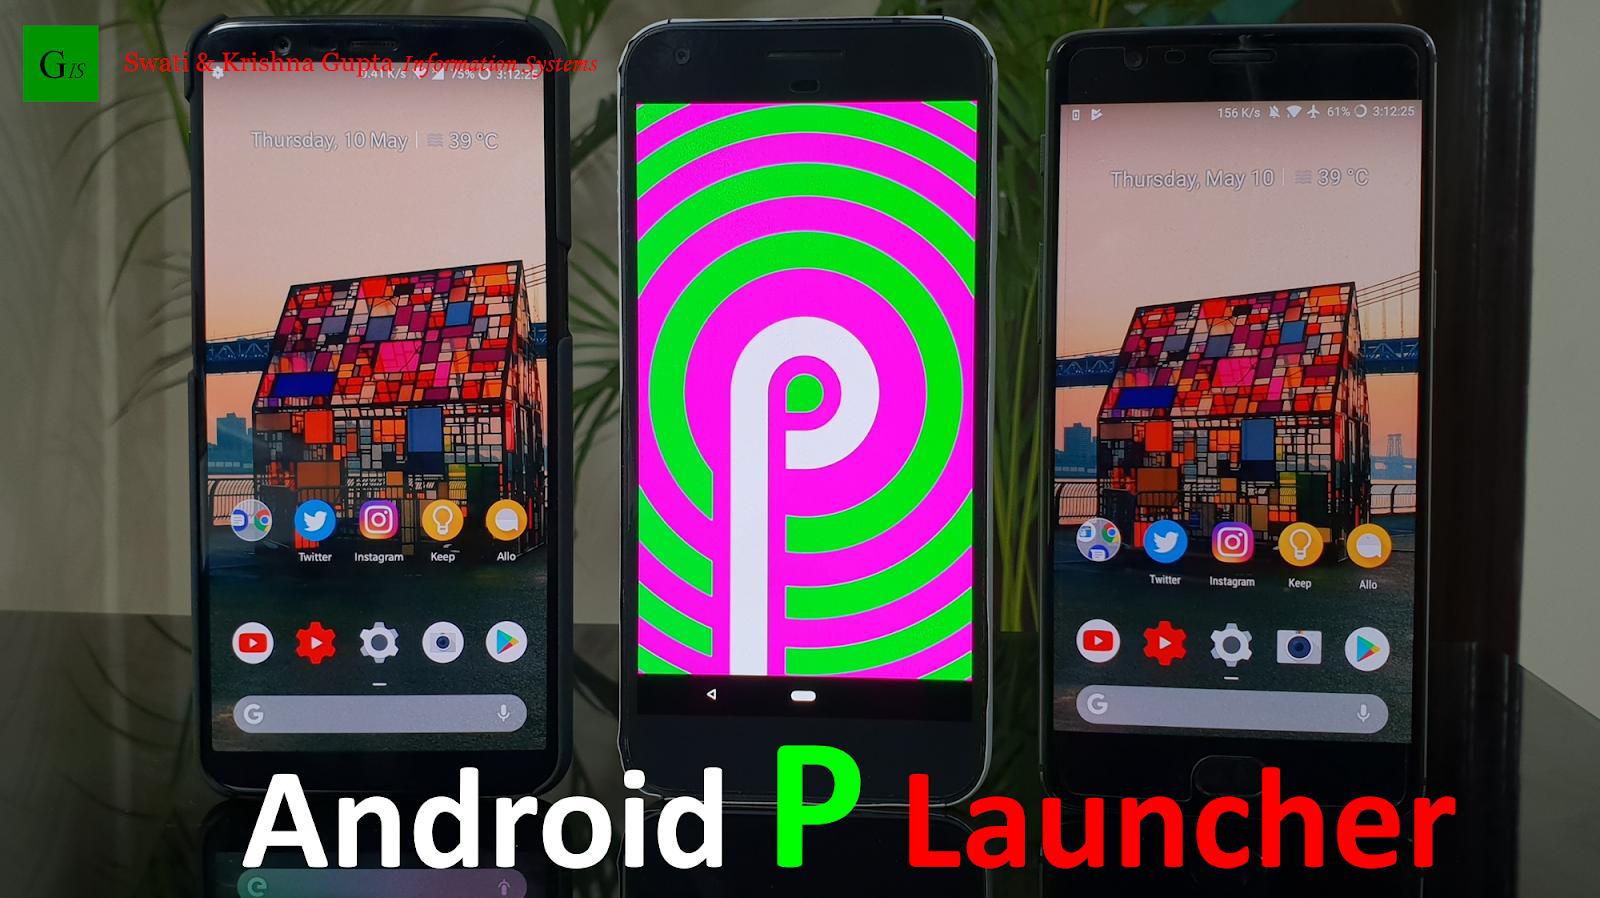 pixel 2 launcher android p 9 downlaod apk install